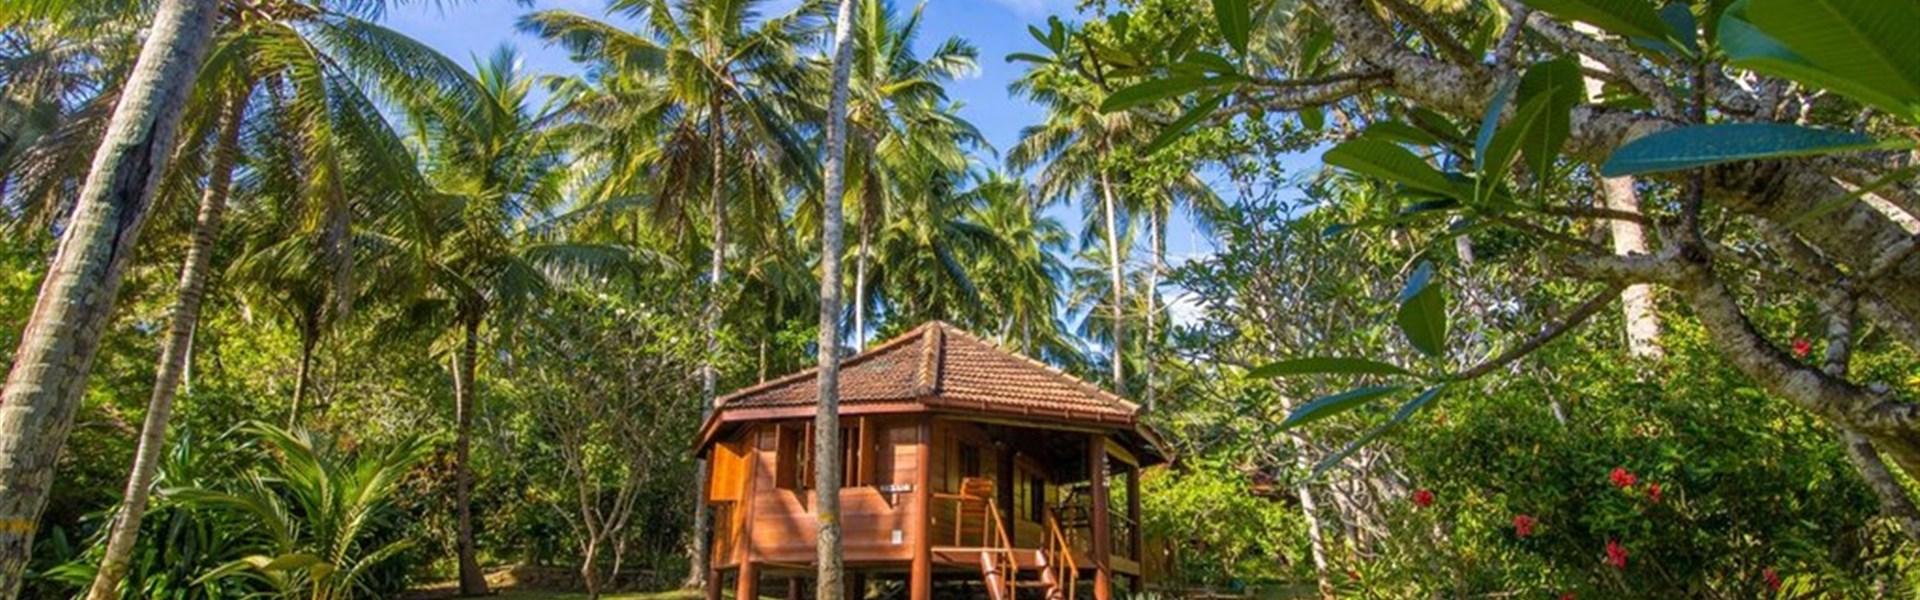 Marco Polo - Palm Paradise Cabanas + Villas - Cabanas